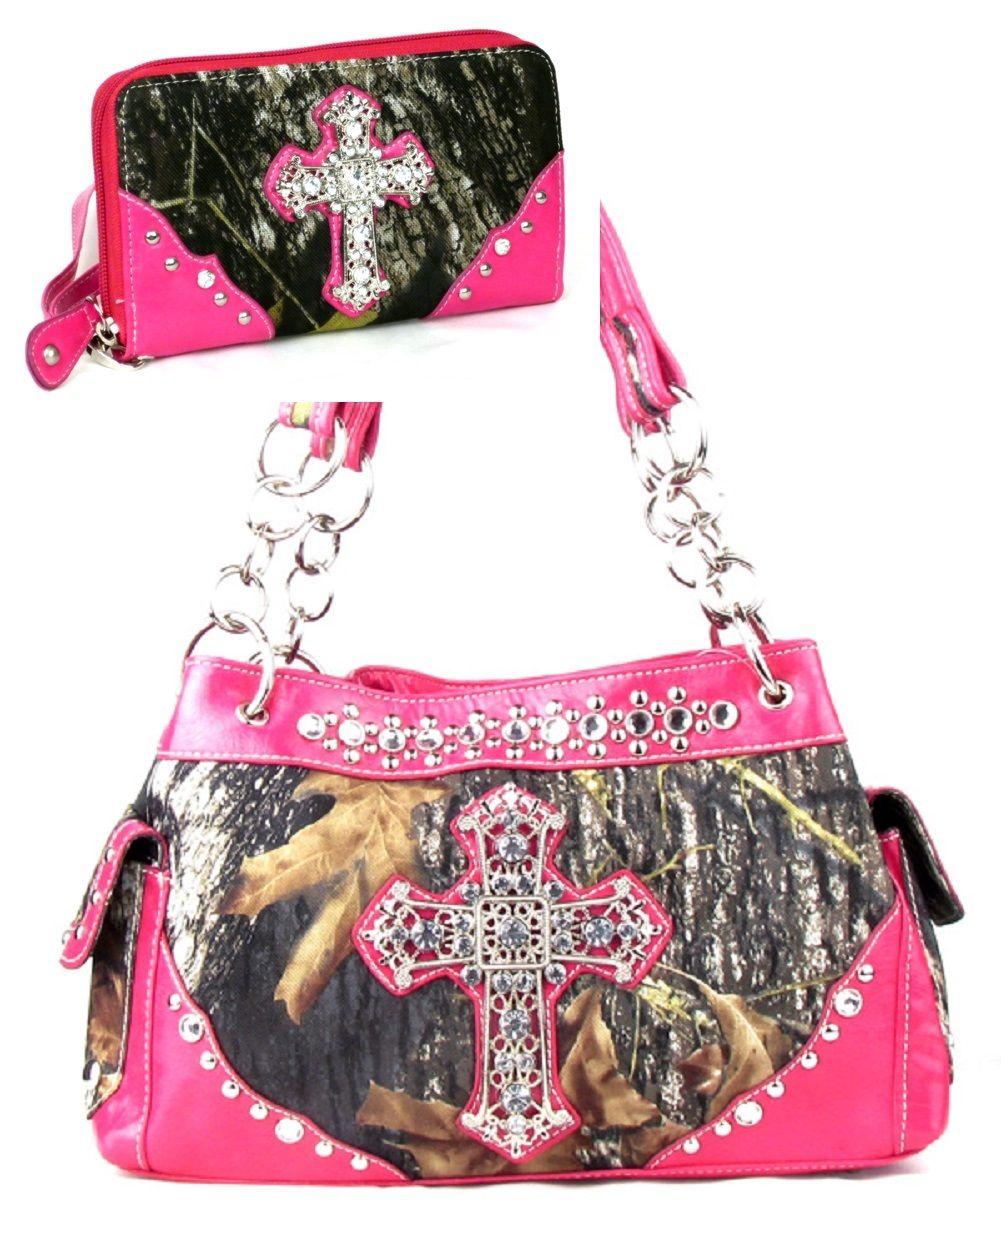 Pink Camo Fashion Cross Purse With Rhinestones W Matching Wallet ...